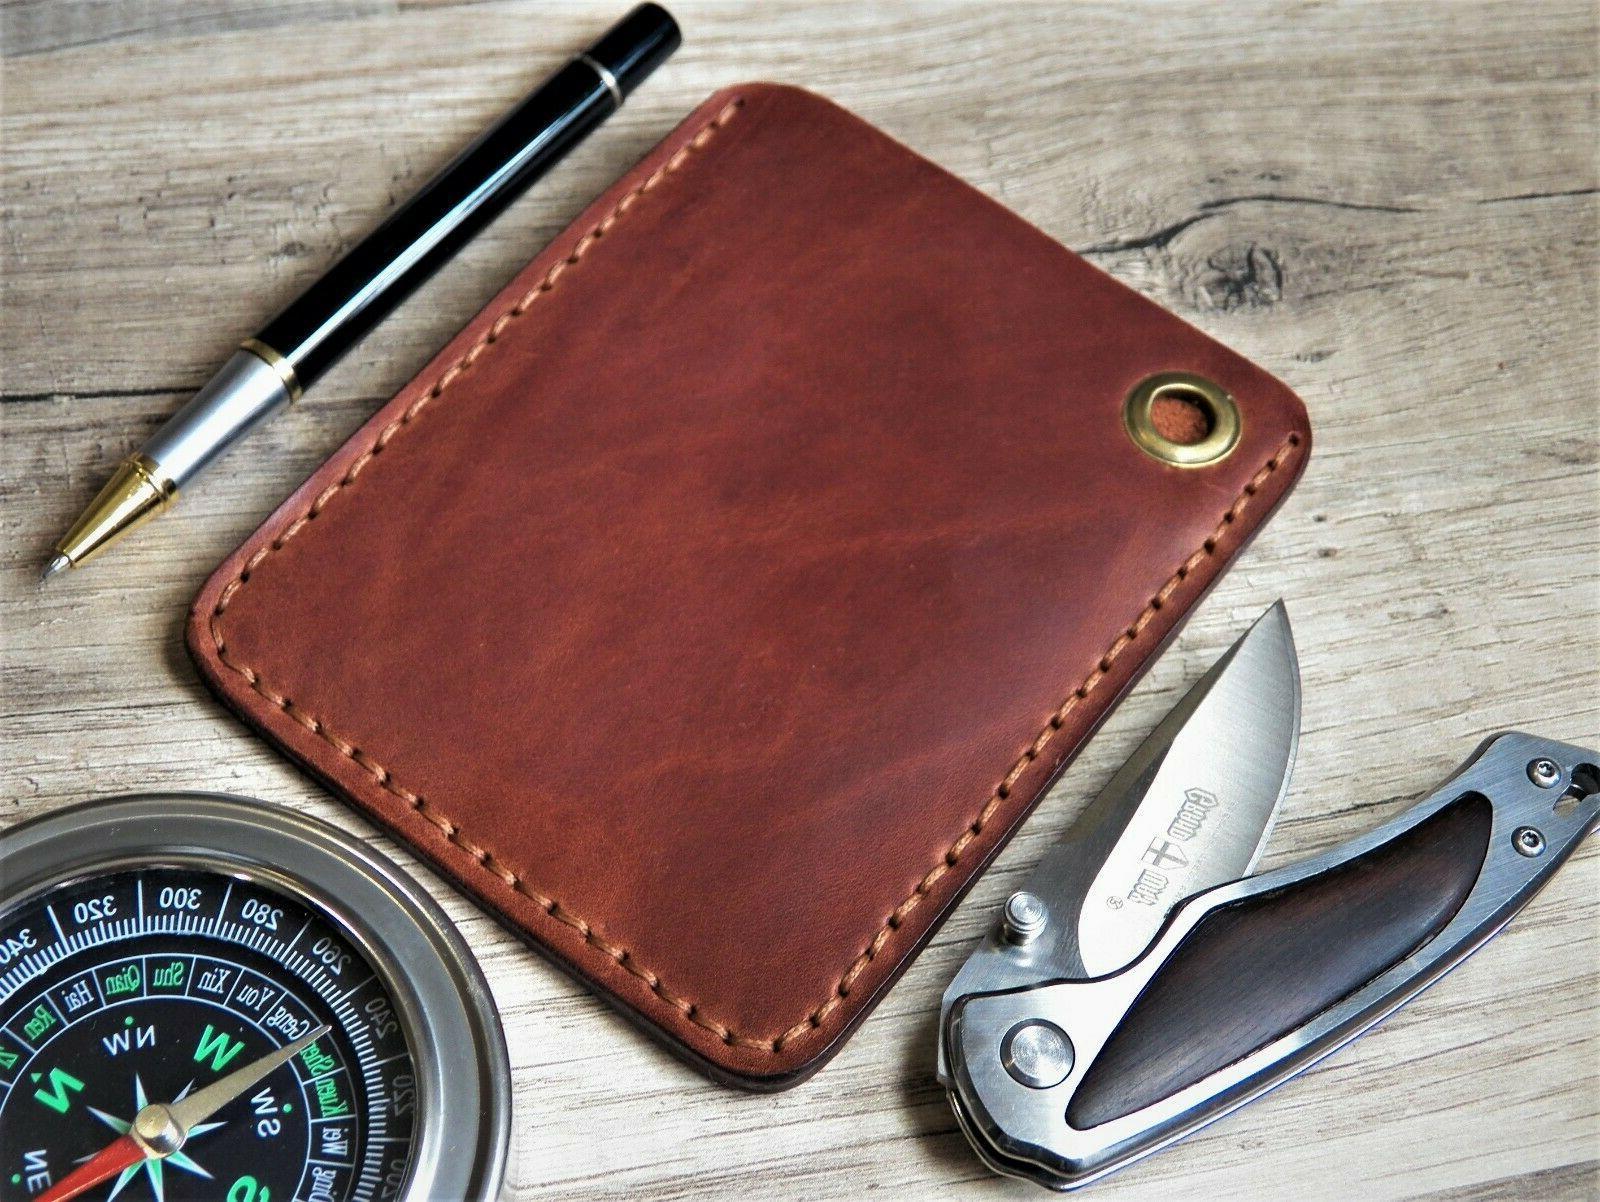 pocket organiser wallet flashlight Leatherman Sheath pouch